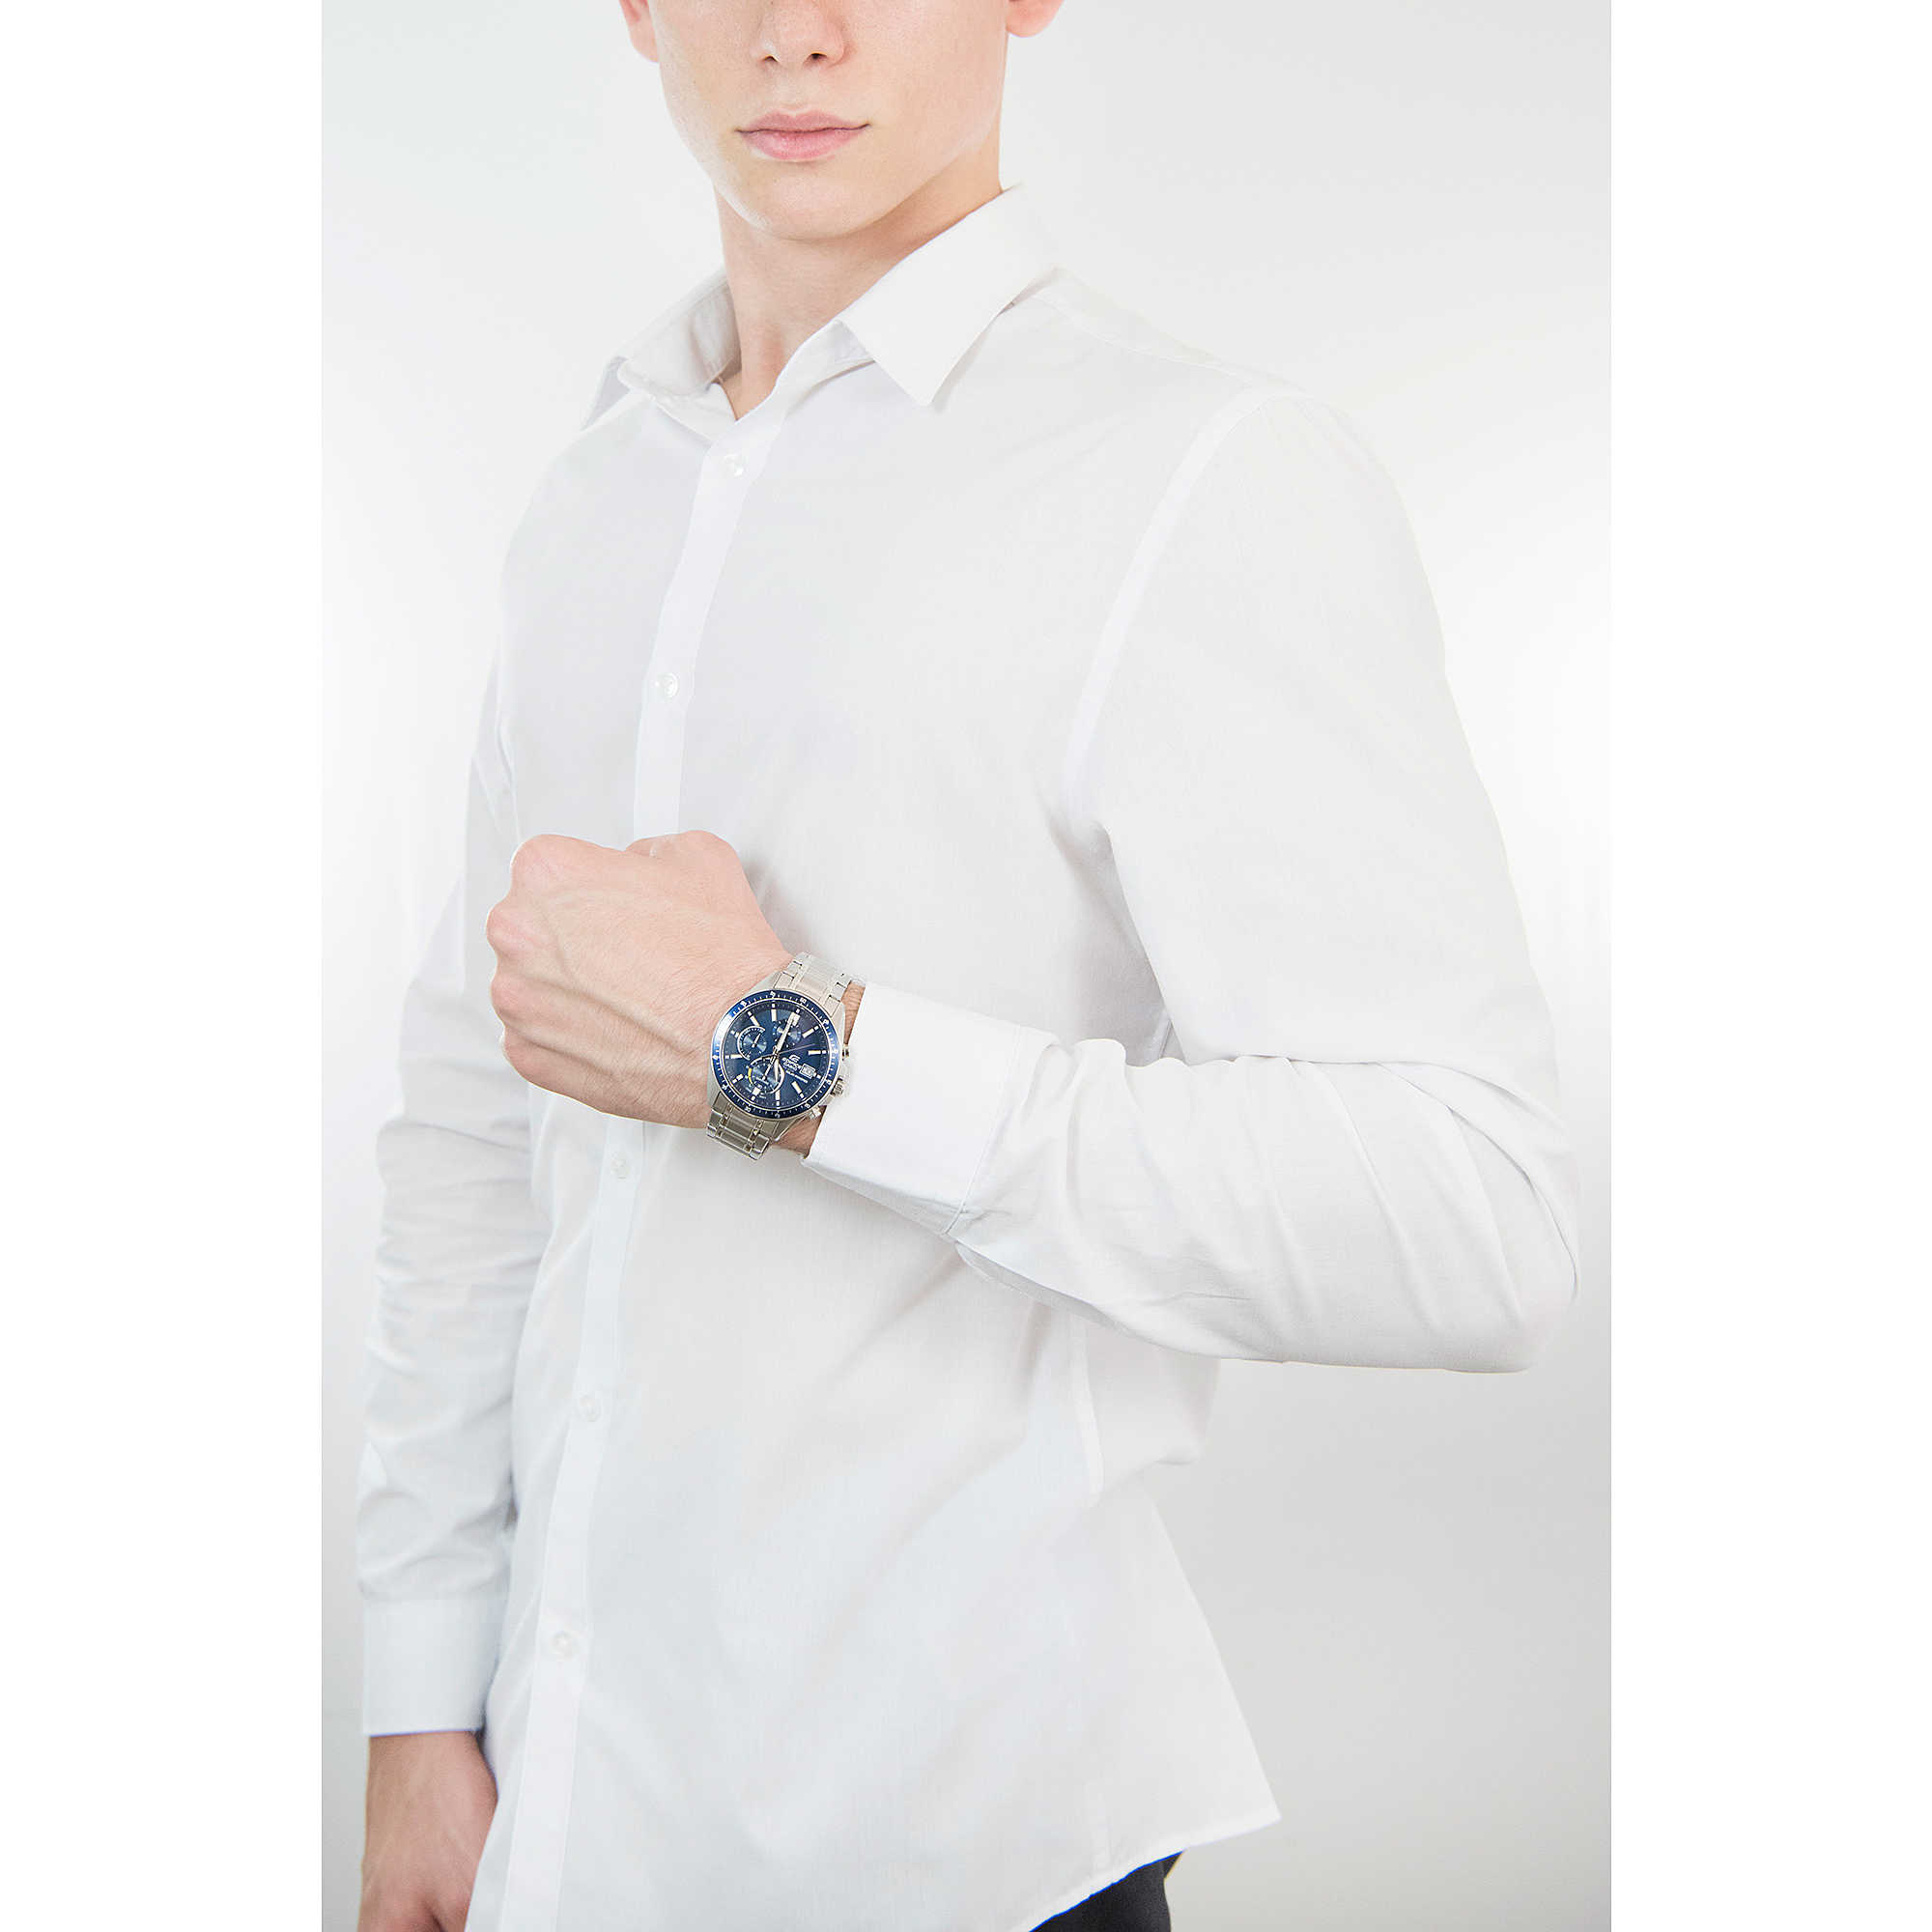 Edifice Mann Casio Multifunktions 2avuef Efs S510d Uhr kOPXZuTi